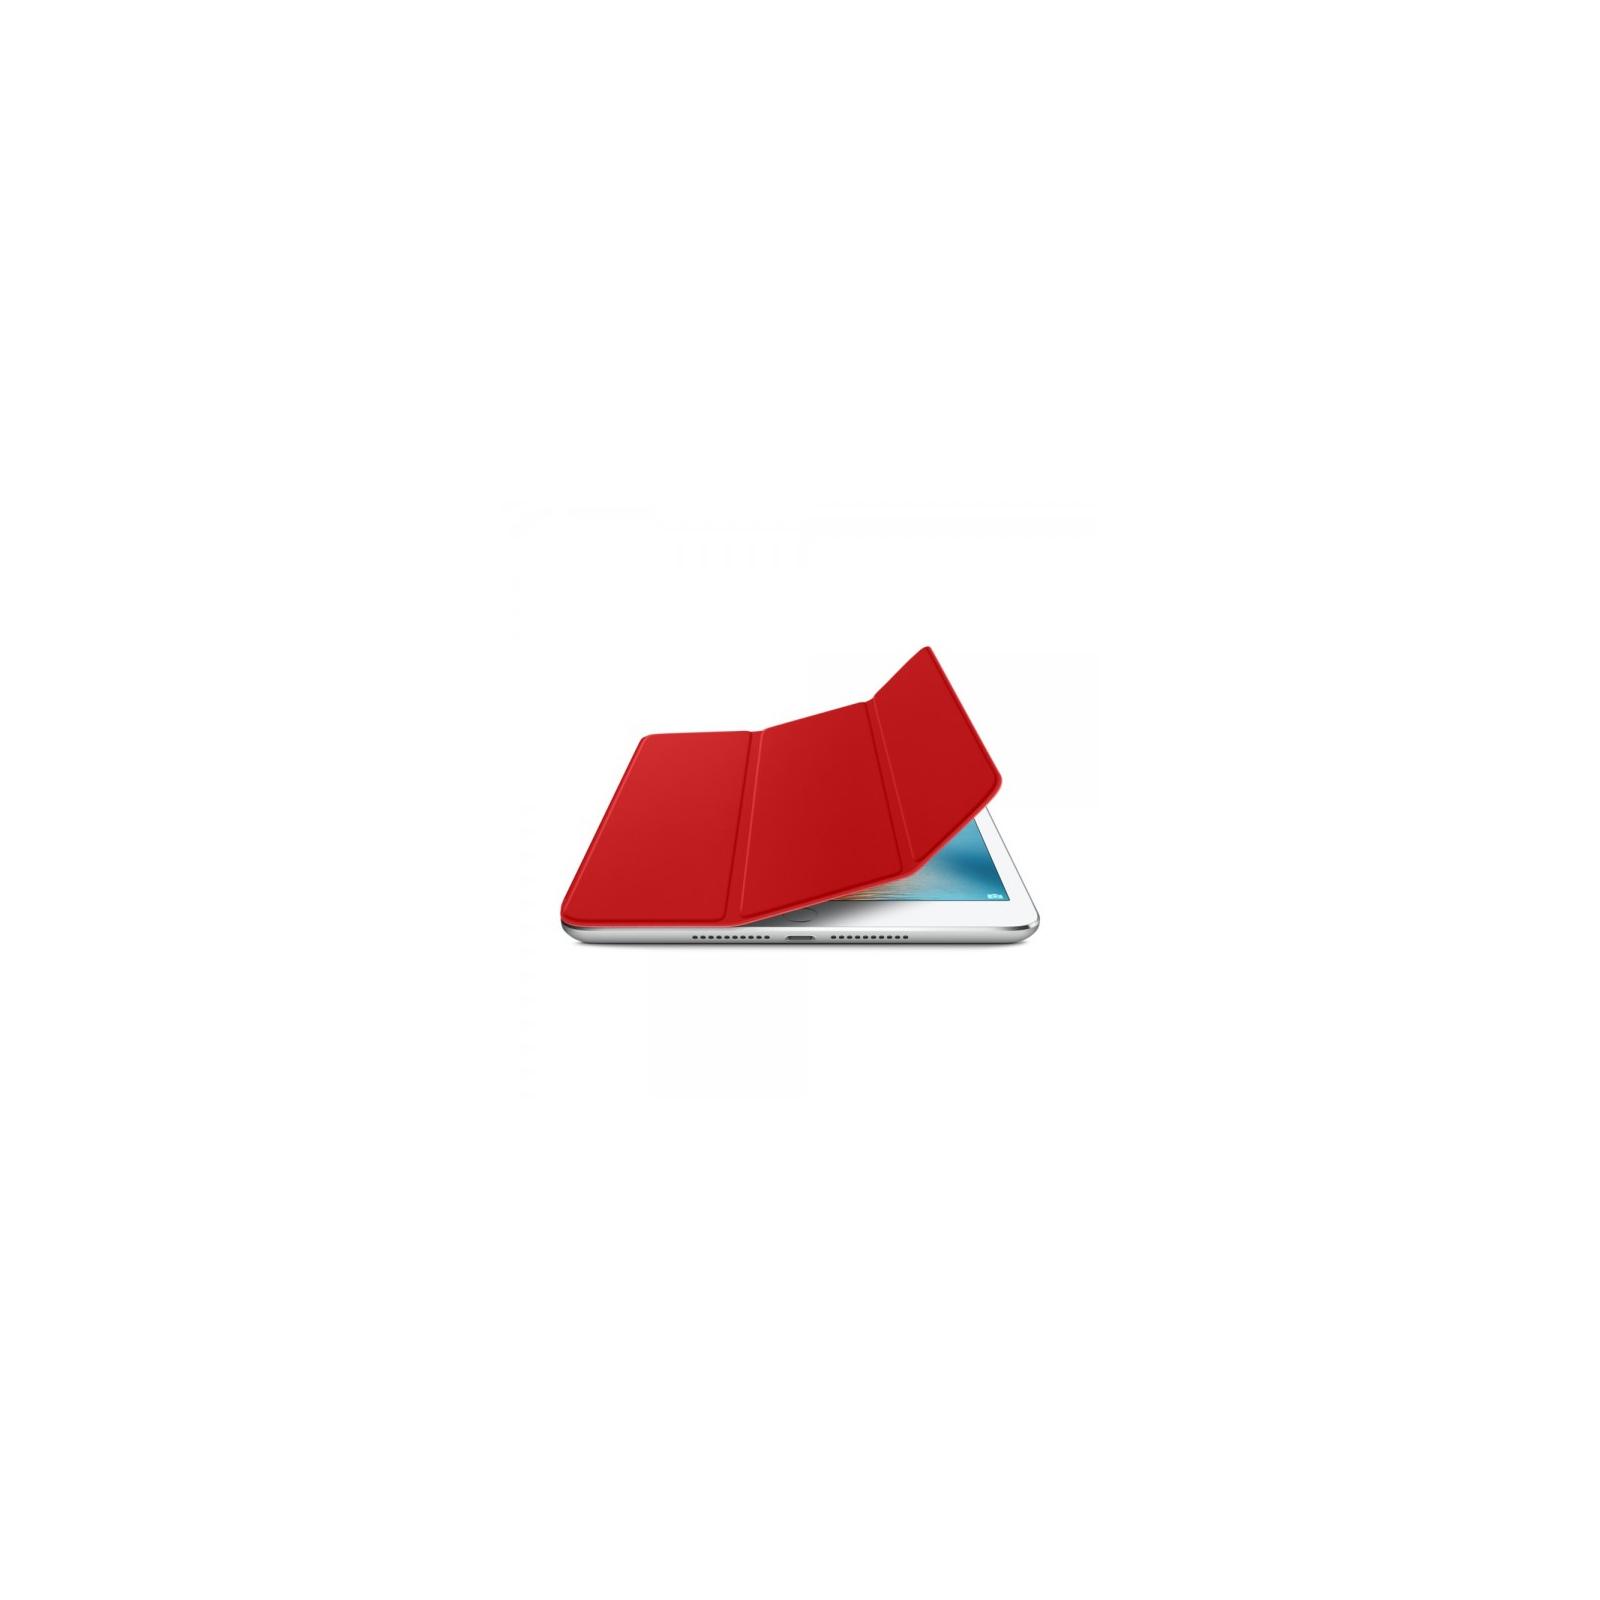 Чехол для планшета Apple Smart Cover для iPad mini 4 Red (MKLY2ZM/A) изображение 2